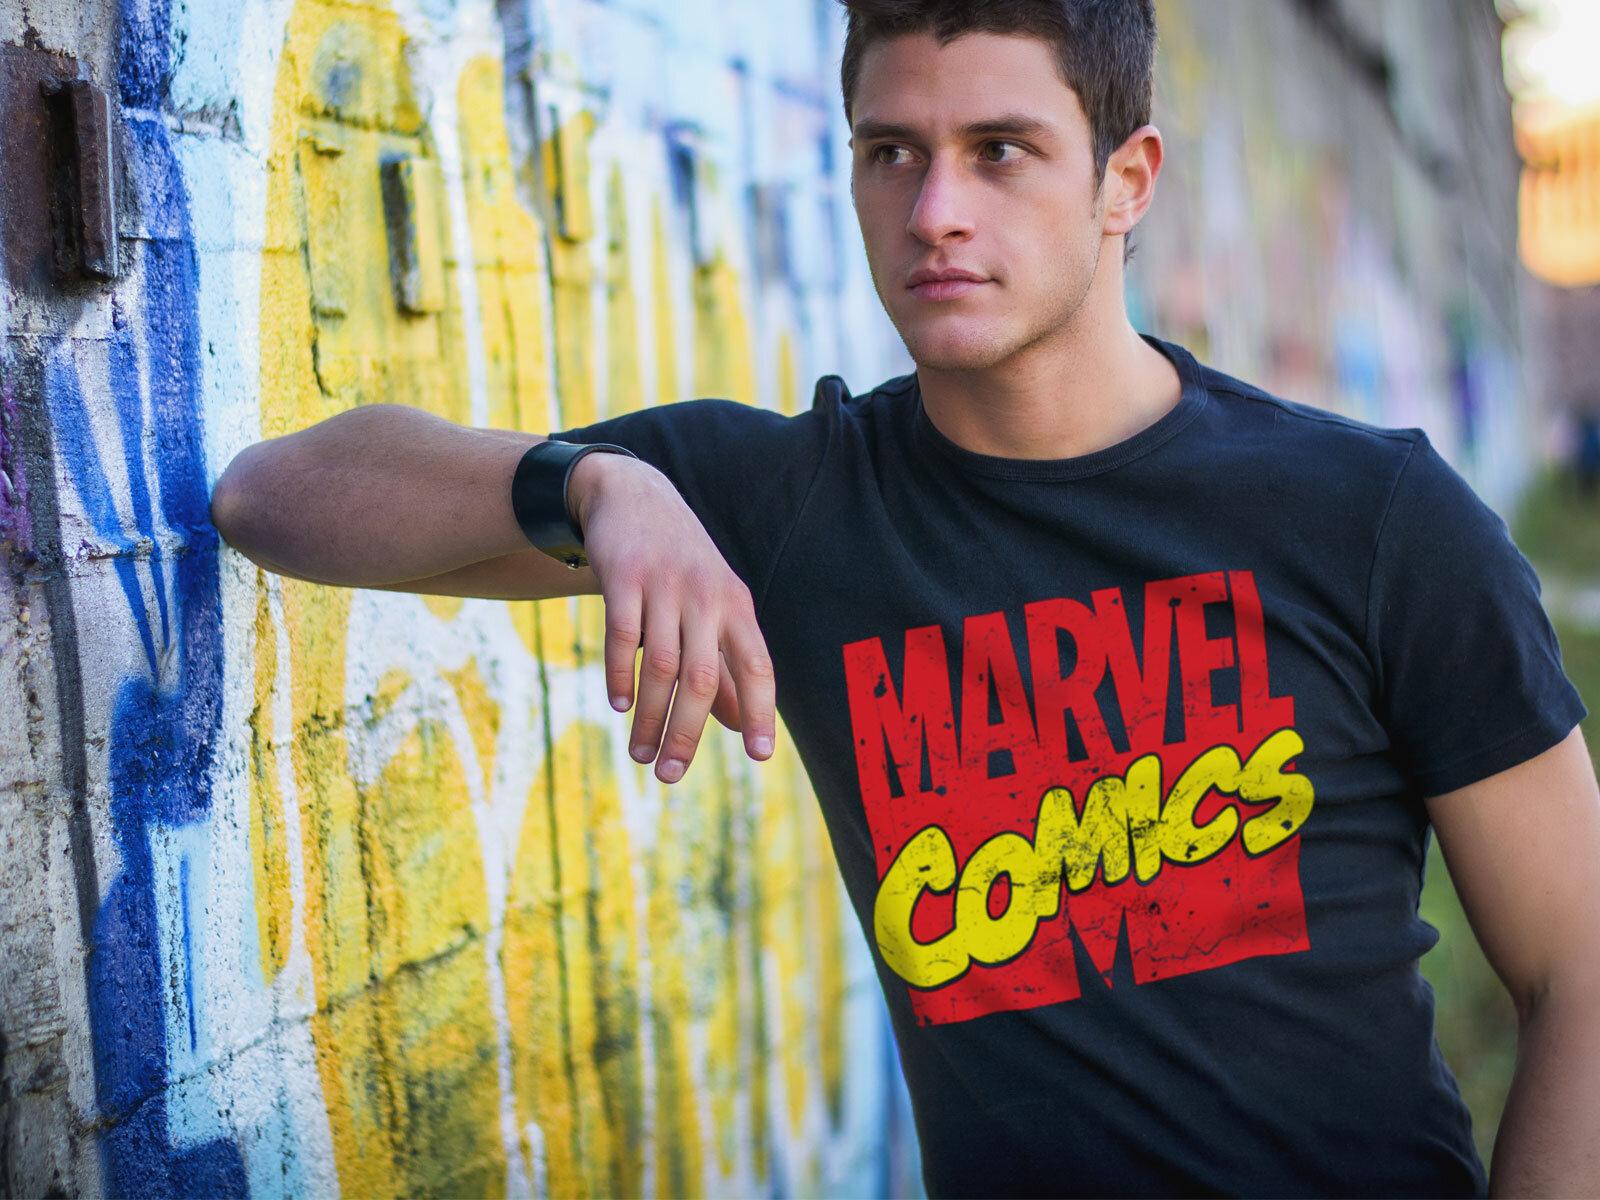 https://www.shirtstore.fi/pub_docs/files/Man/MAN-BigRigh-MarvelRetro.jpg